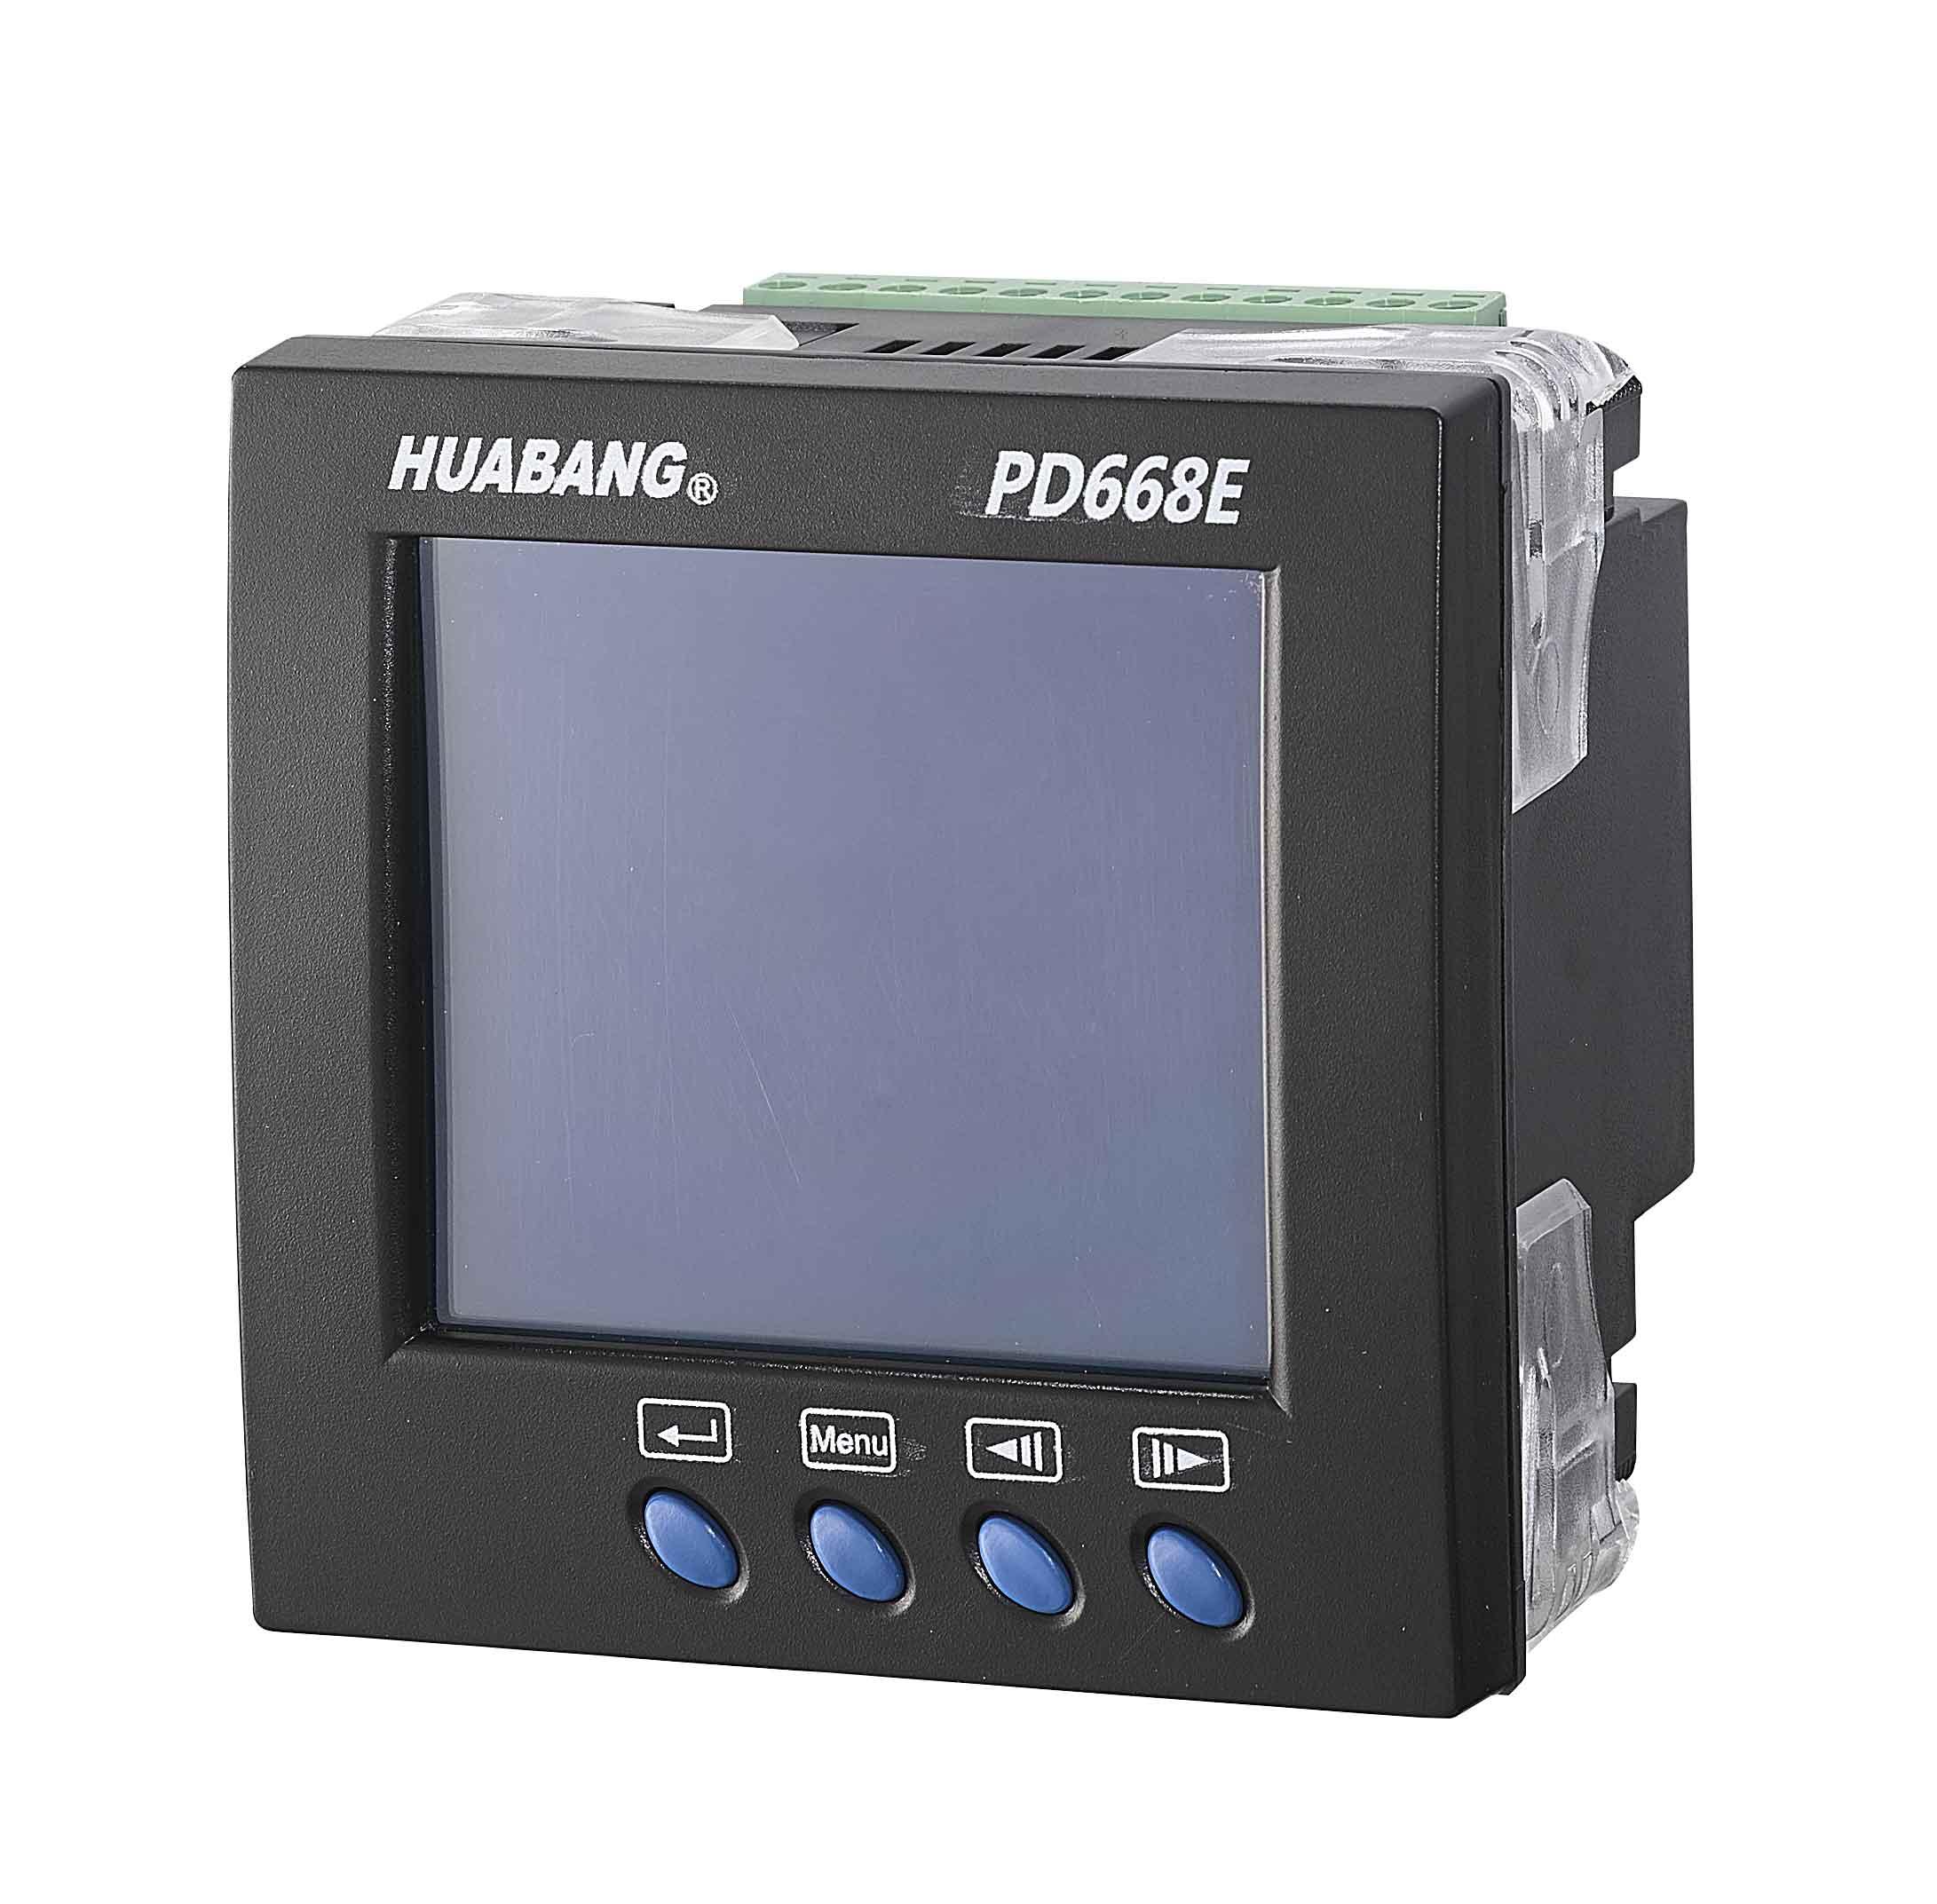 PD668E-9S4Y 高端.jpg